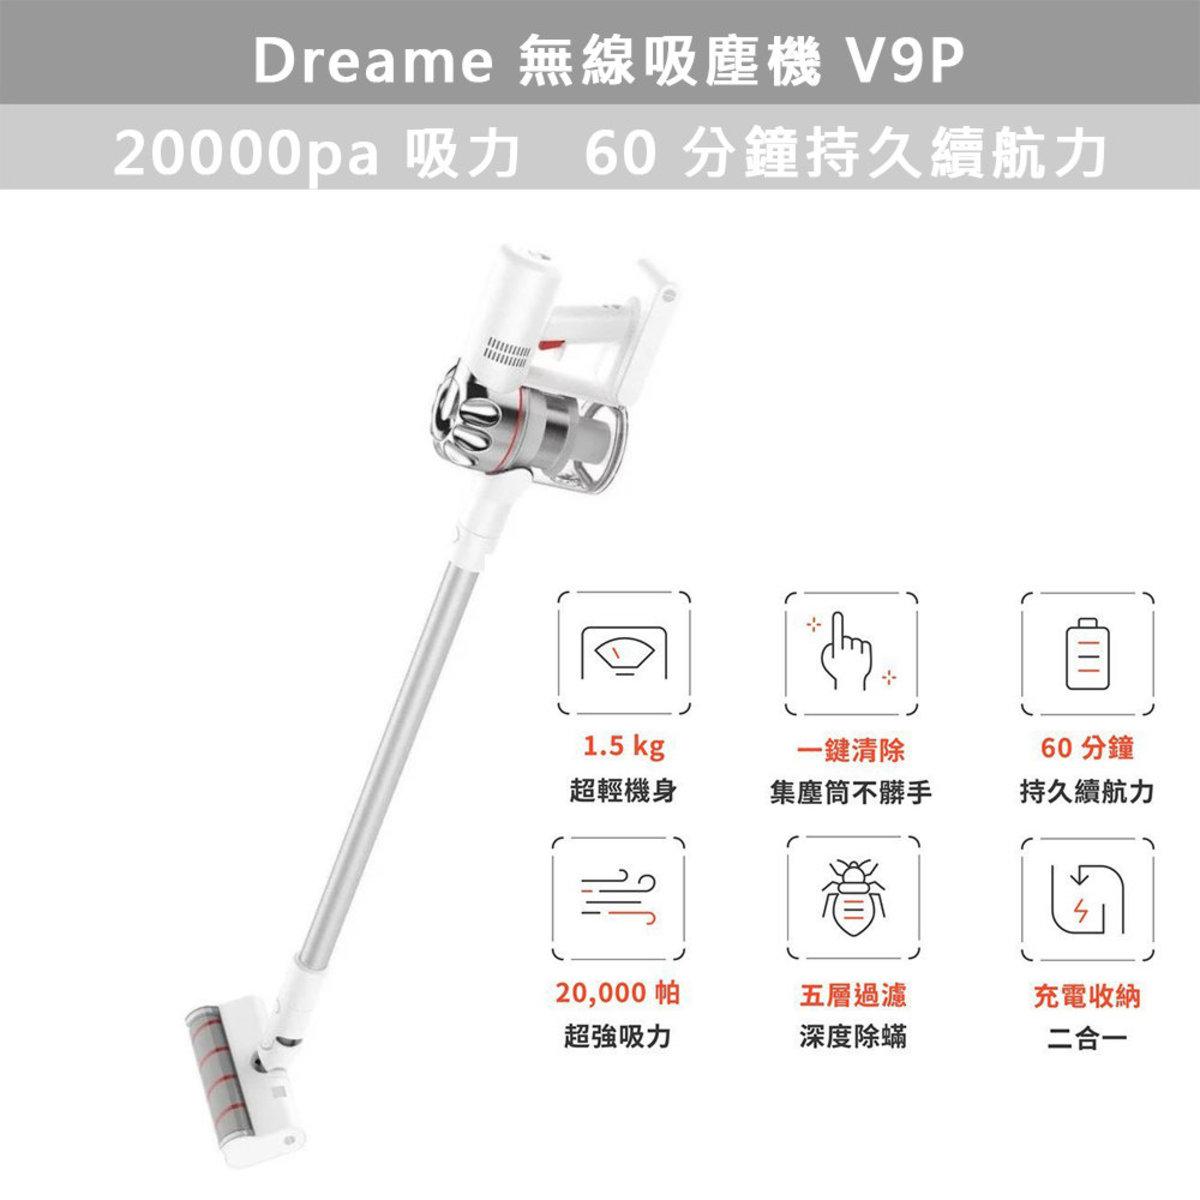 Dreame Vacuum Cleaner - V9P